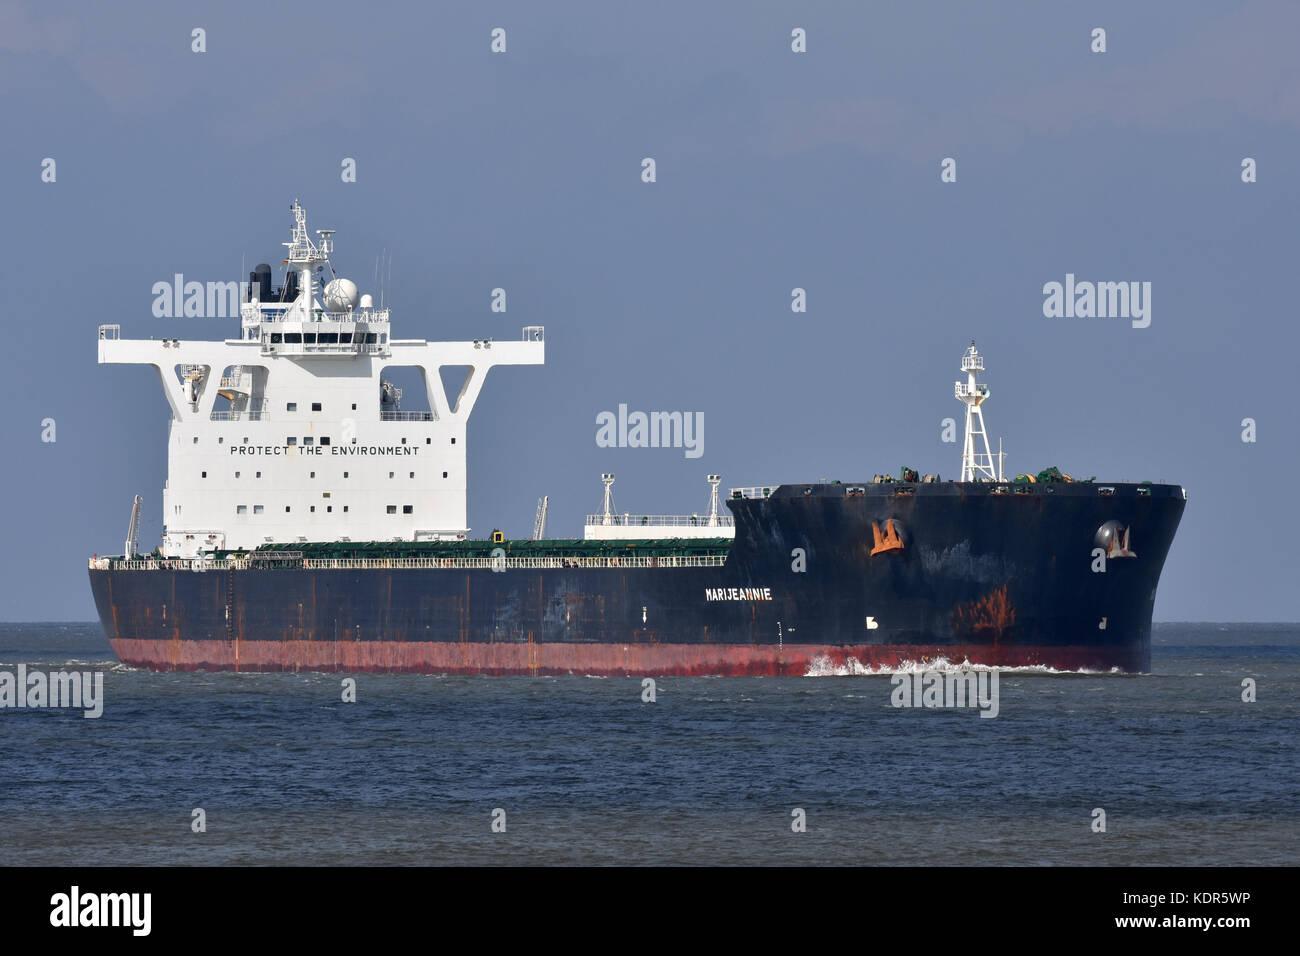 Marijeannie - Stock Image